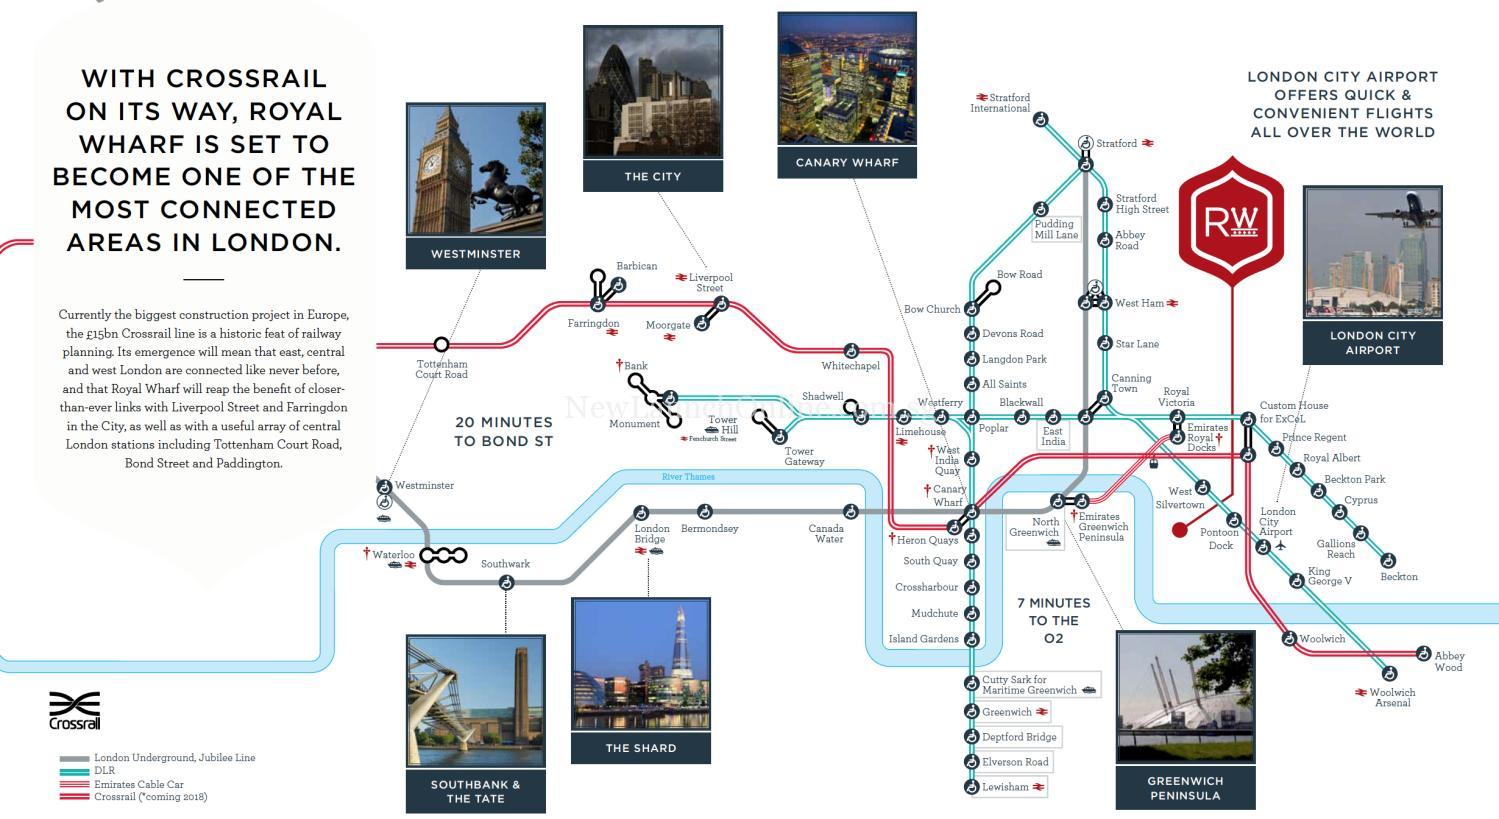 Royal Wharf London - Crossrail 2018 completion